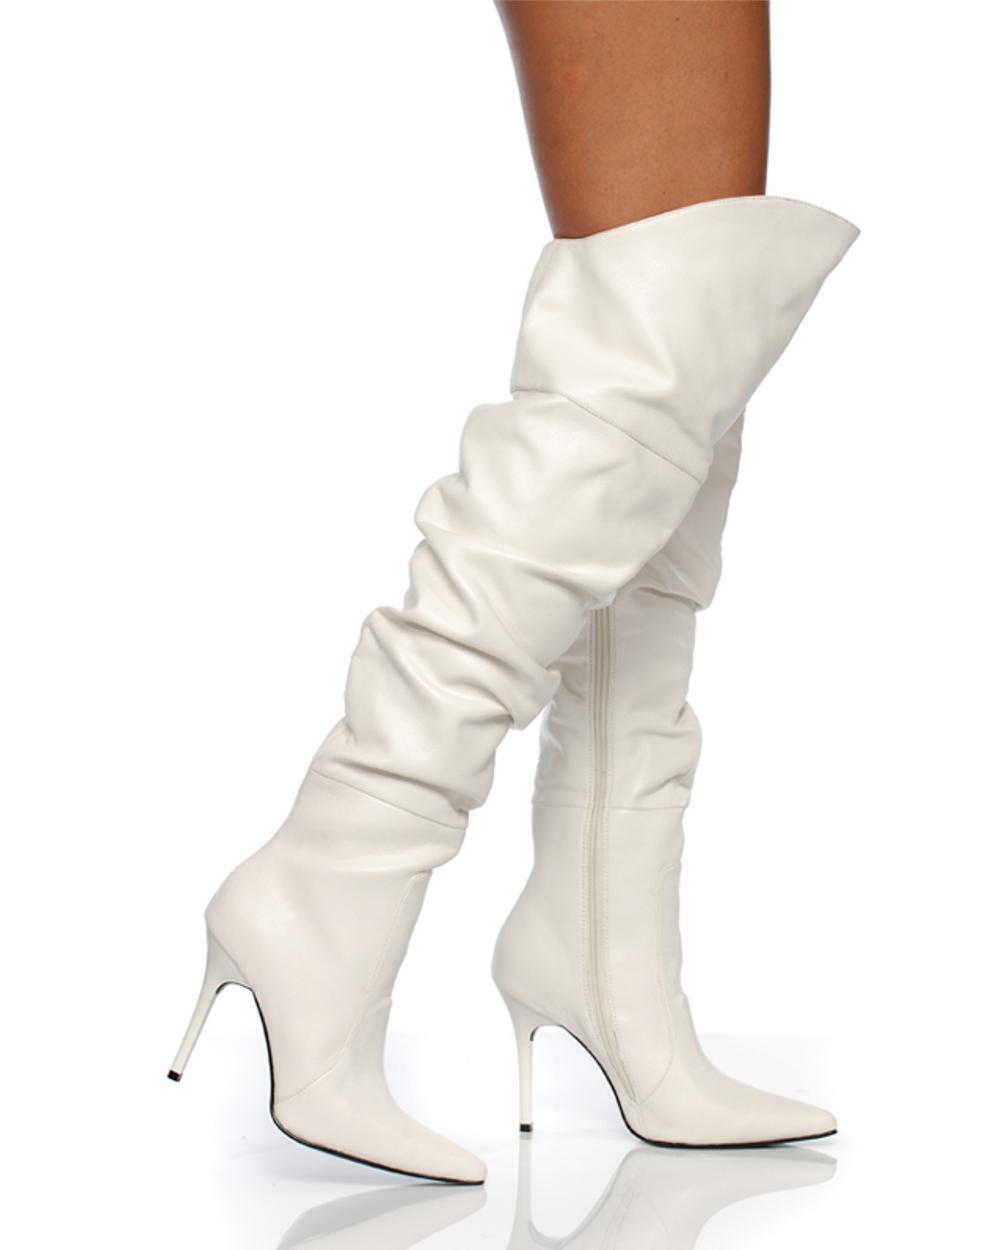 "Women's Shoes 4"" Thigh High Scrunch Boot Classic Pump Construction White Soft PU"